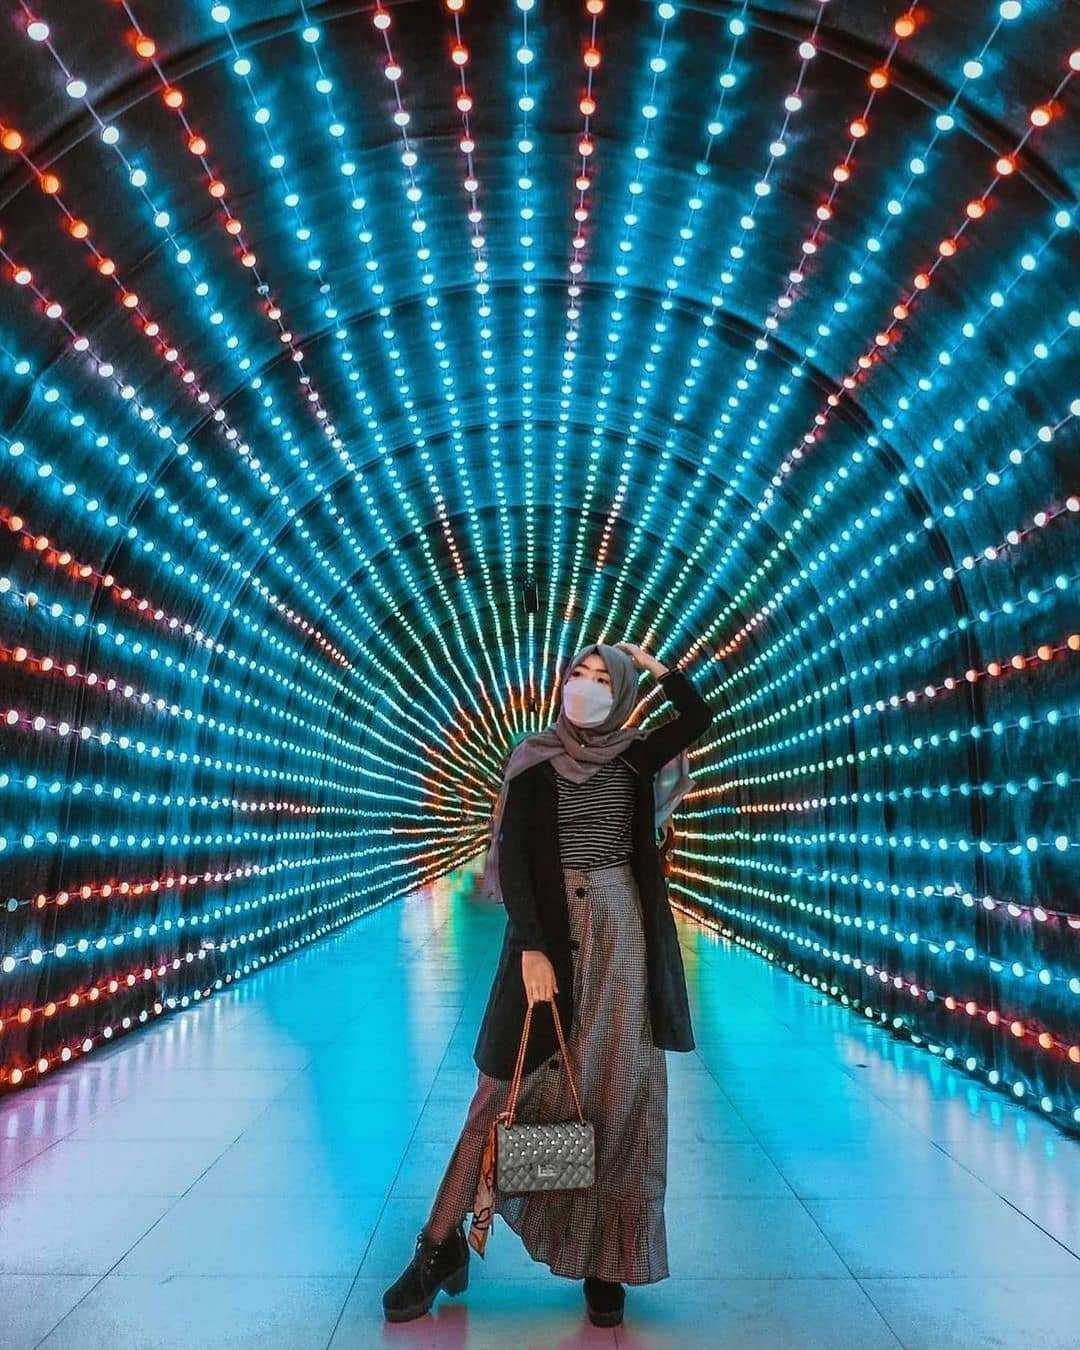 Berfoto di Terowongan Lampu Yang ada di Malang Night Paradise Image From @muliya_jazz